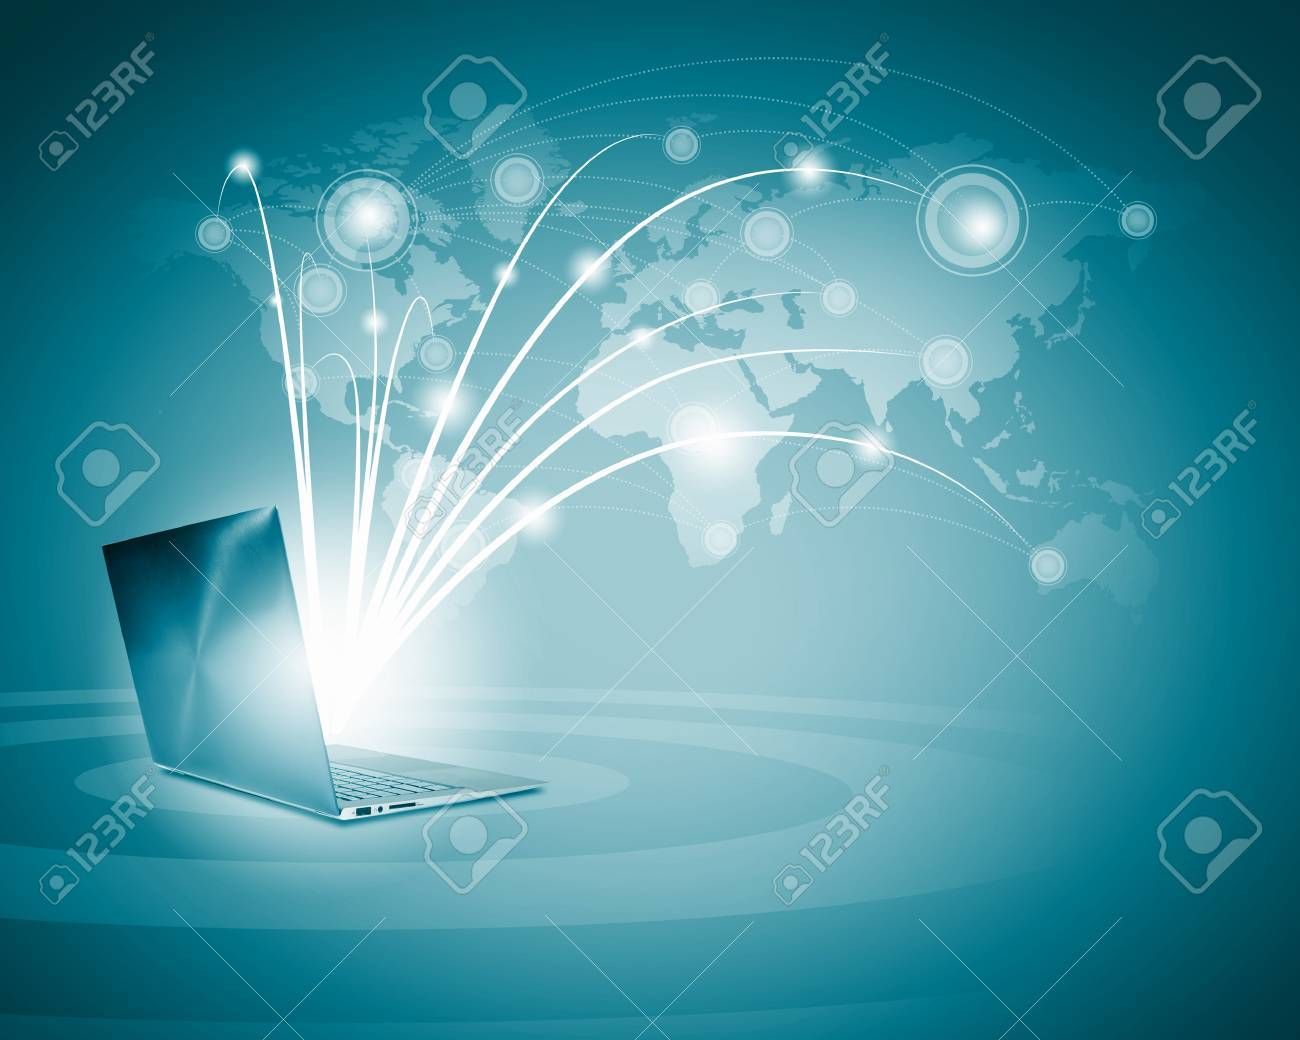 Laptops against globe blue illustration  Globalization concepts Stock Illustration - 21729239